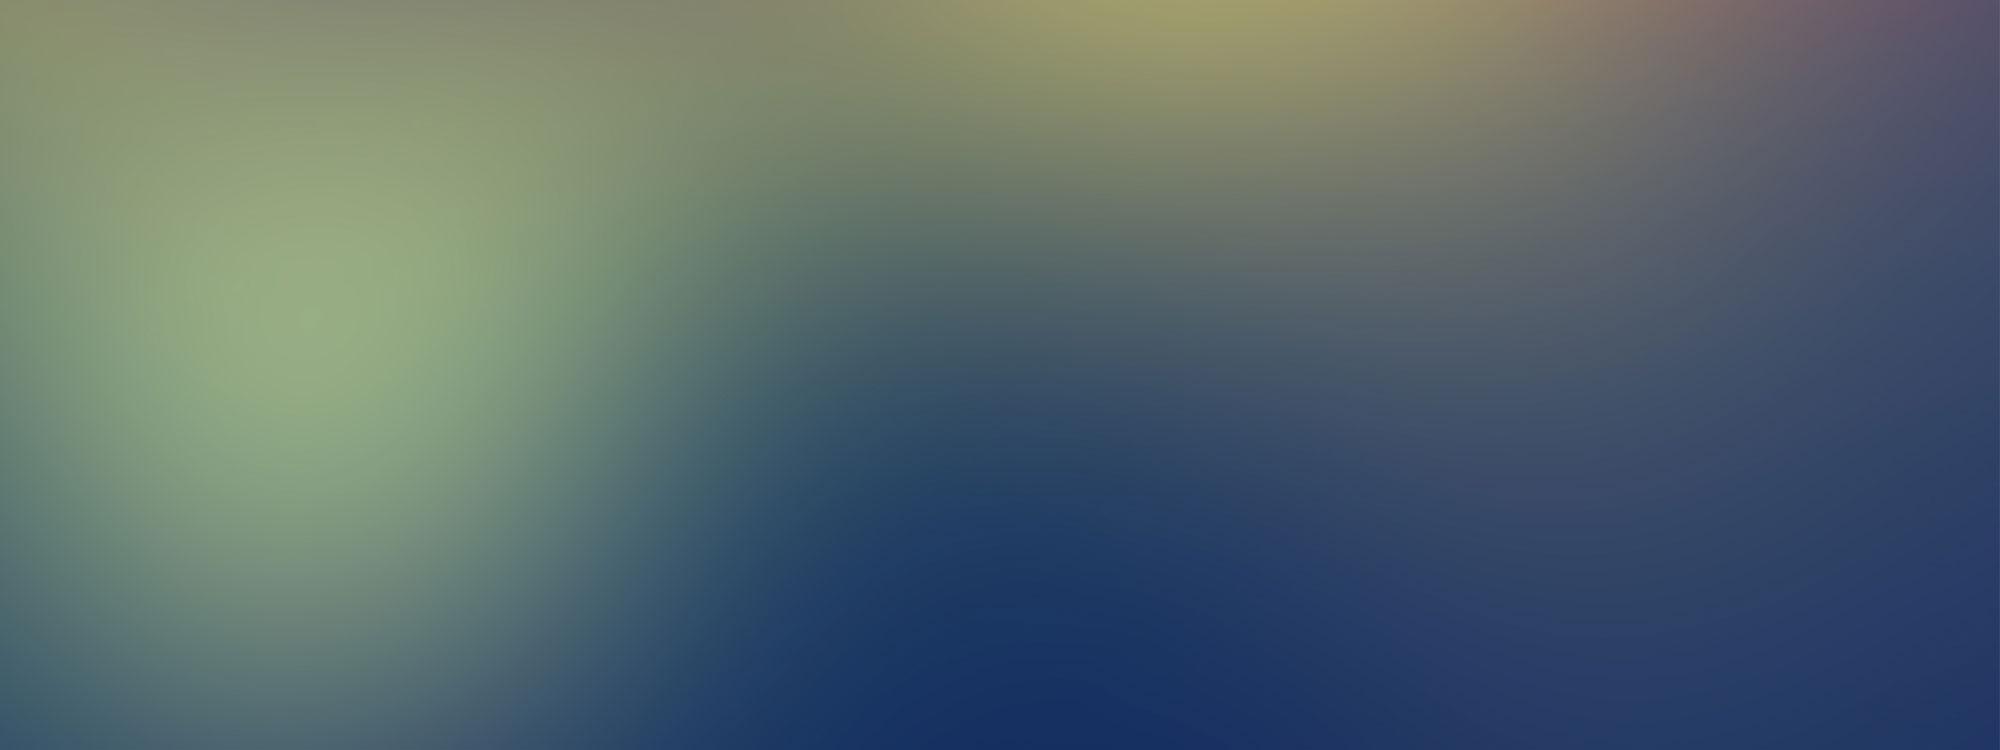 Blur_Background_October_2017_04